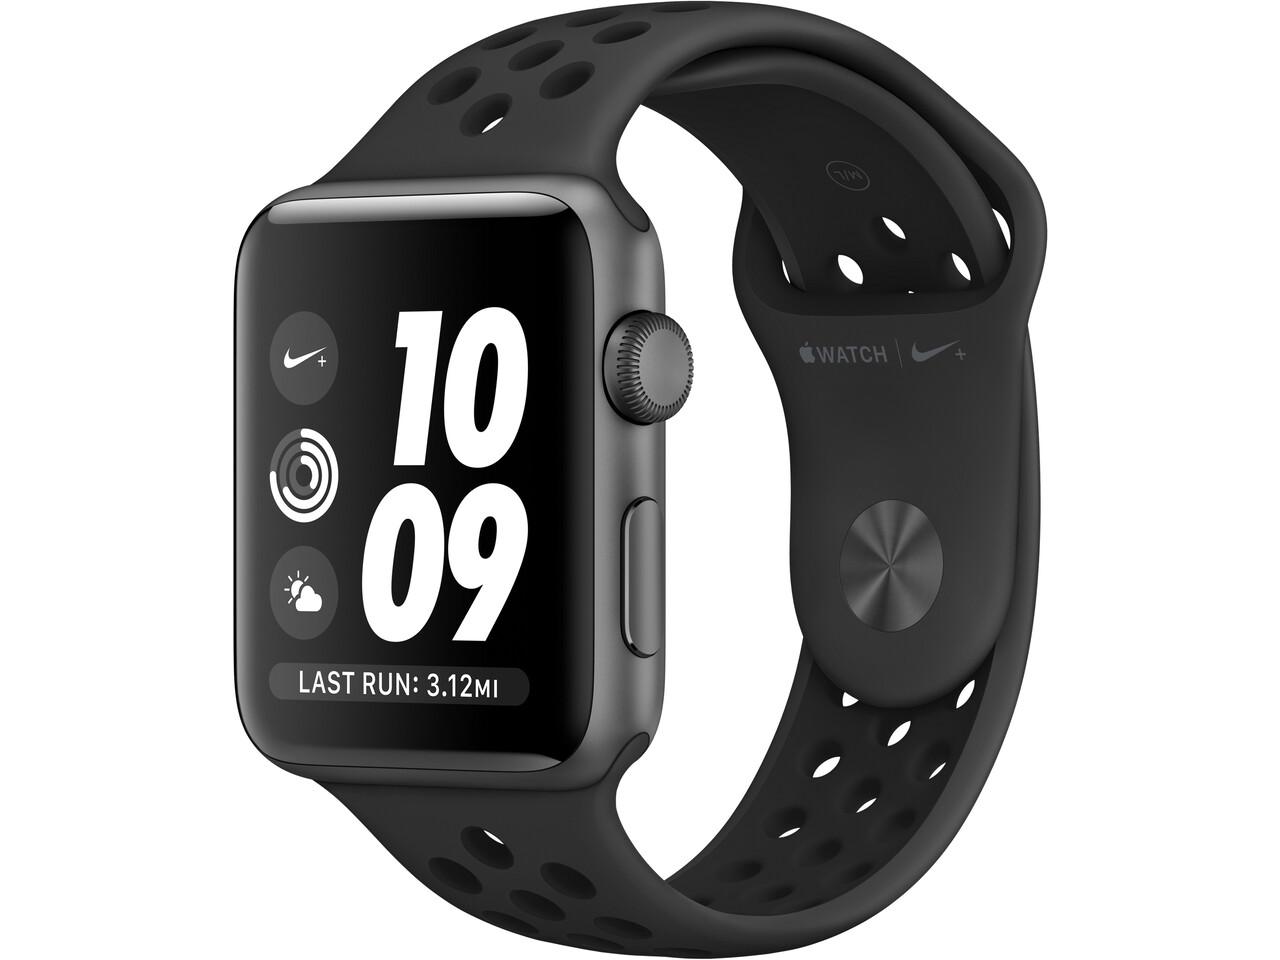 apple watch nike series 3 42mm space gray aluminum black nike sport band